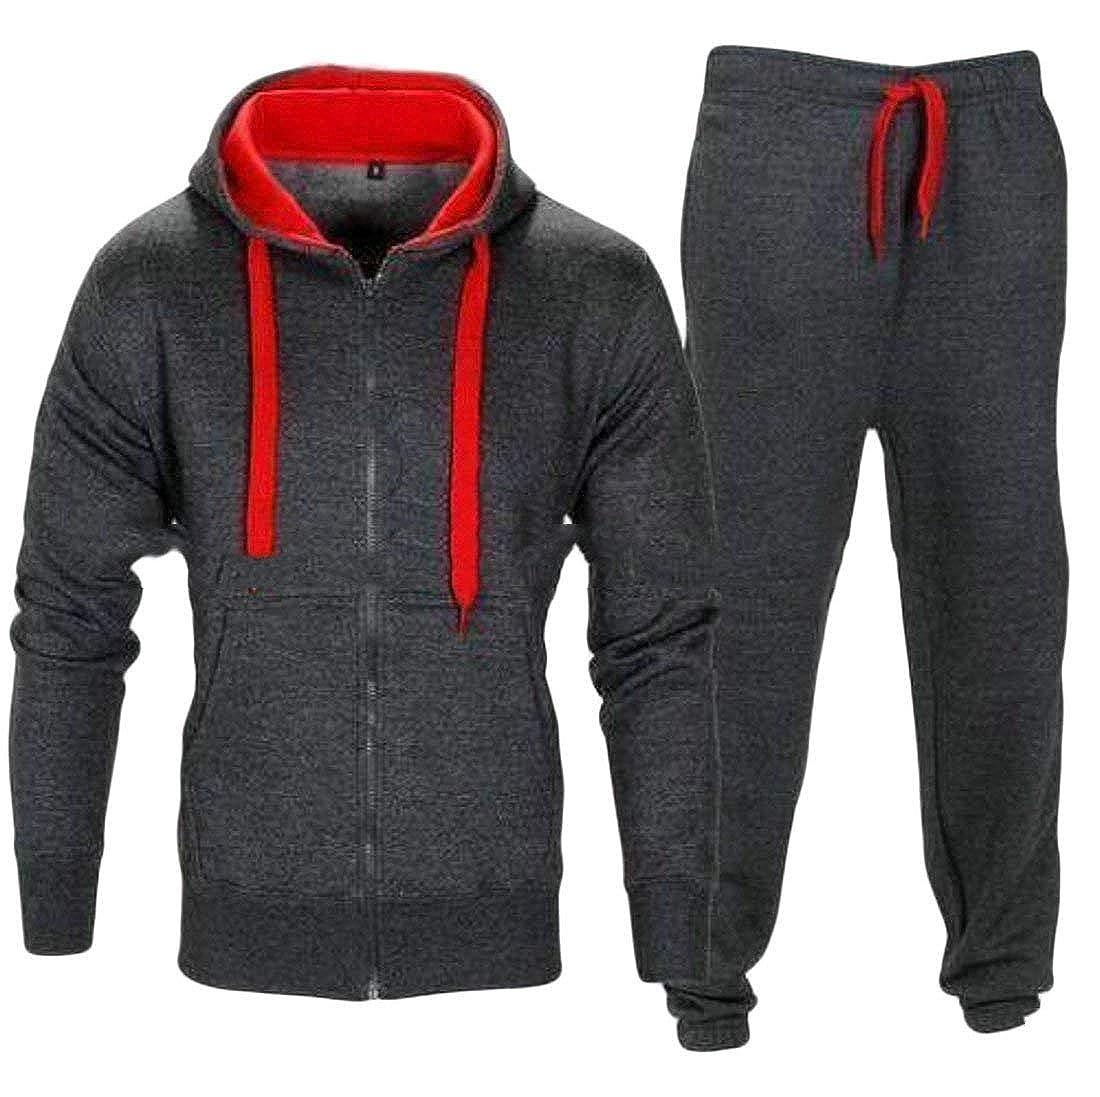 BU2H Men Multicolor Plus Size Sport Hoodies Sweatshirt Sweatpant Set Tracksuit Activewear